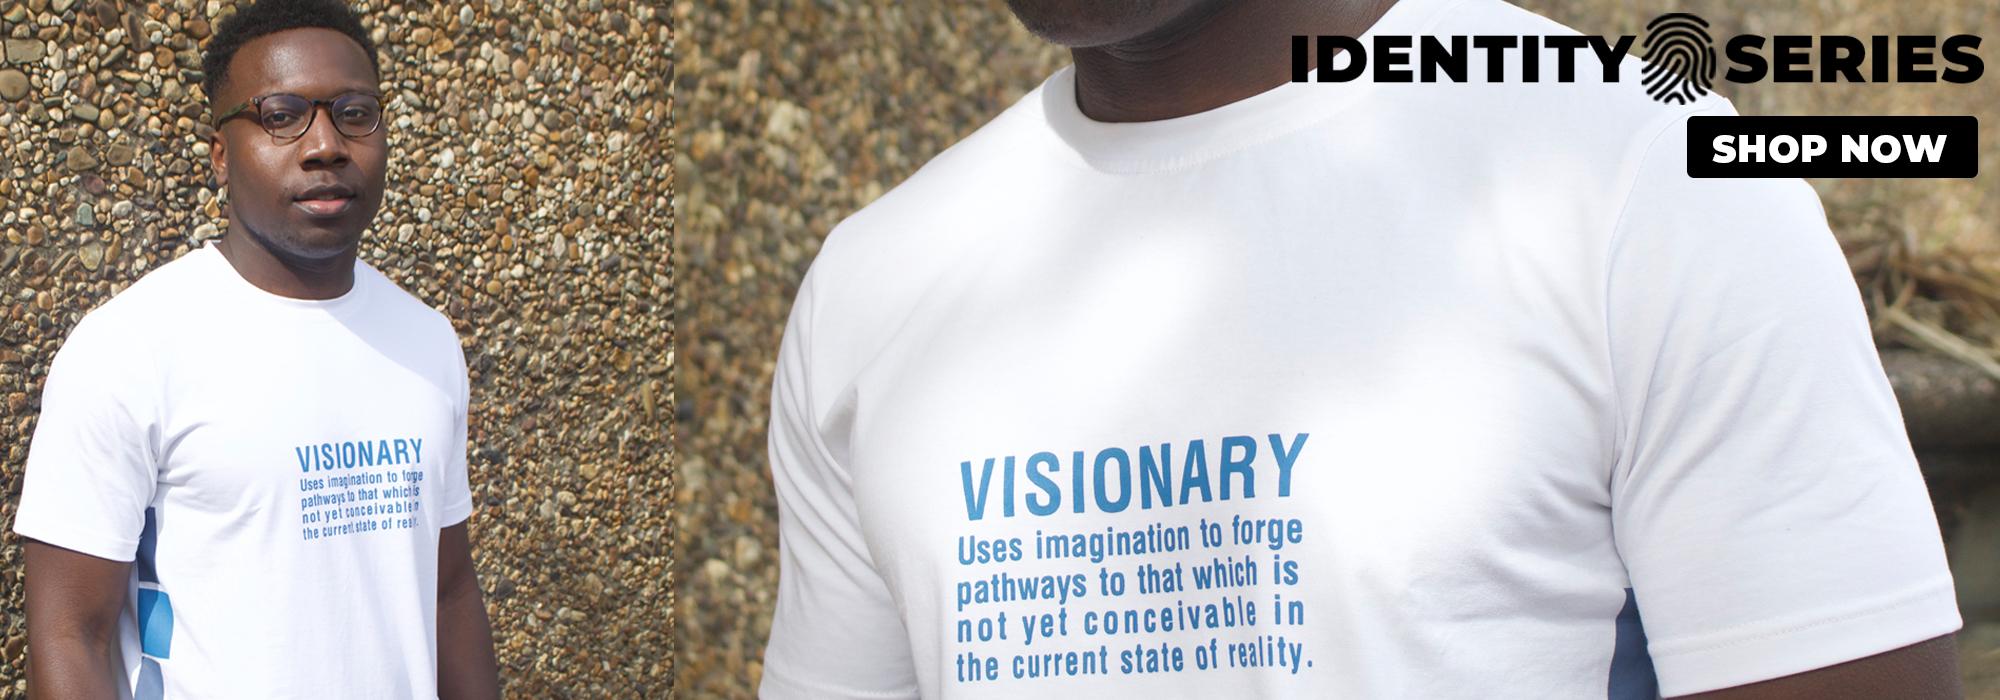 Visionary Tee Photo Header.jpg